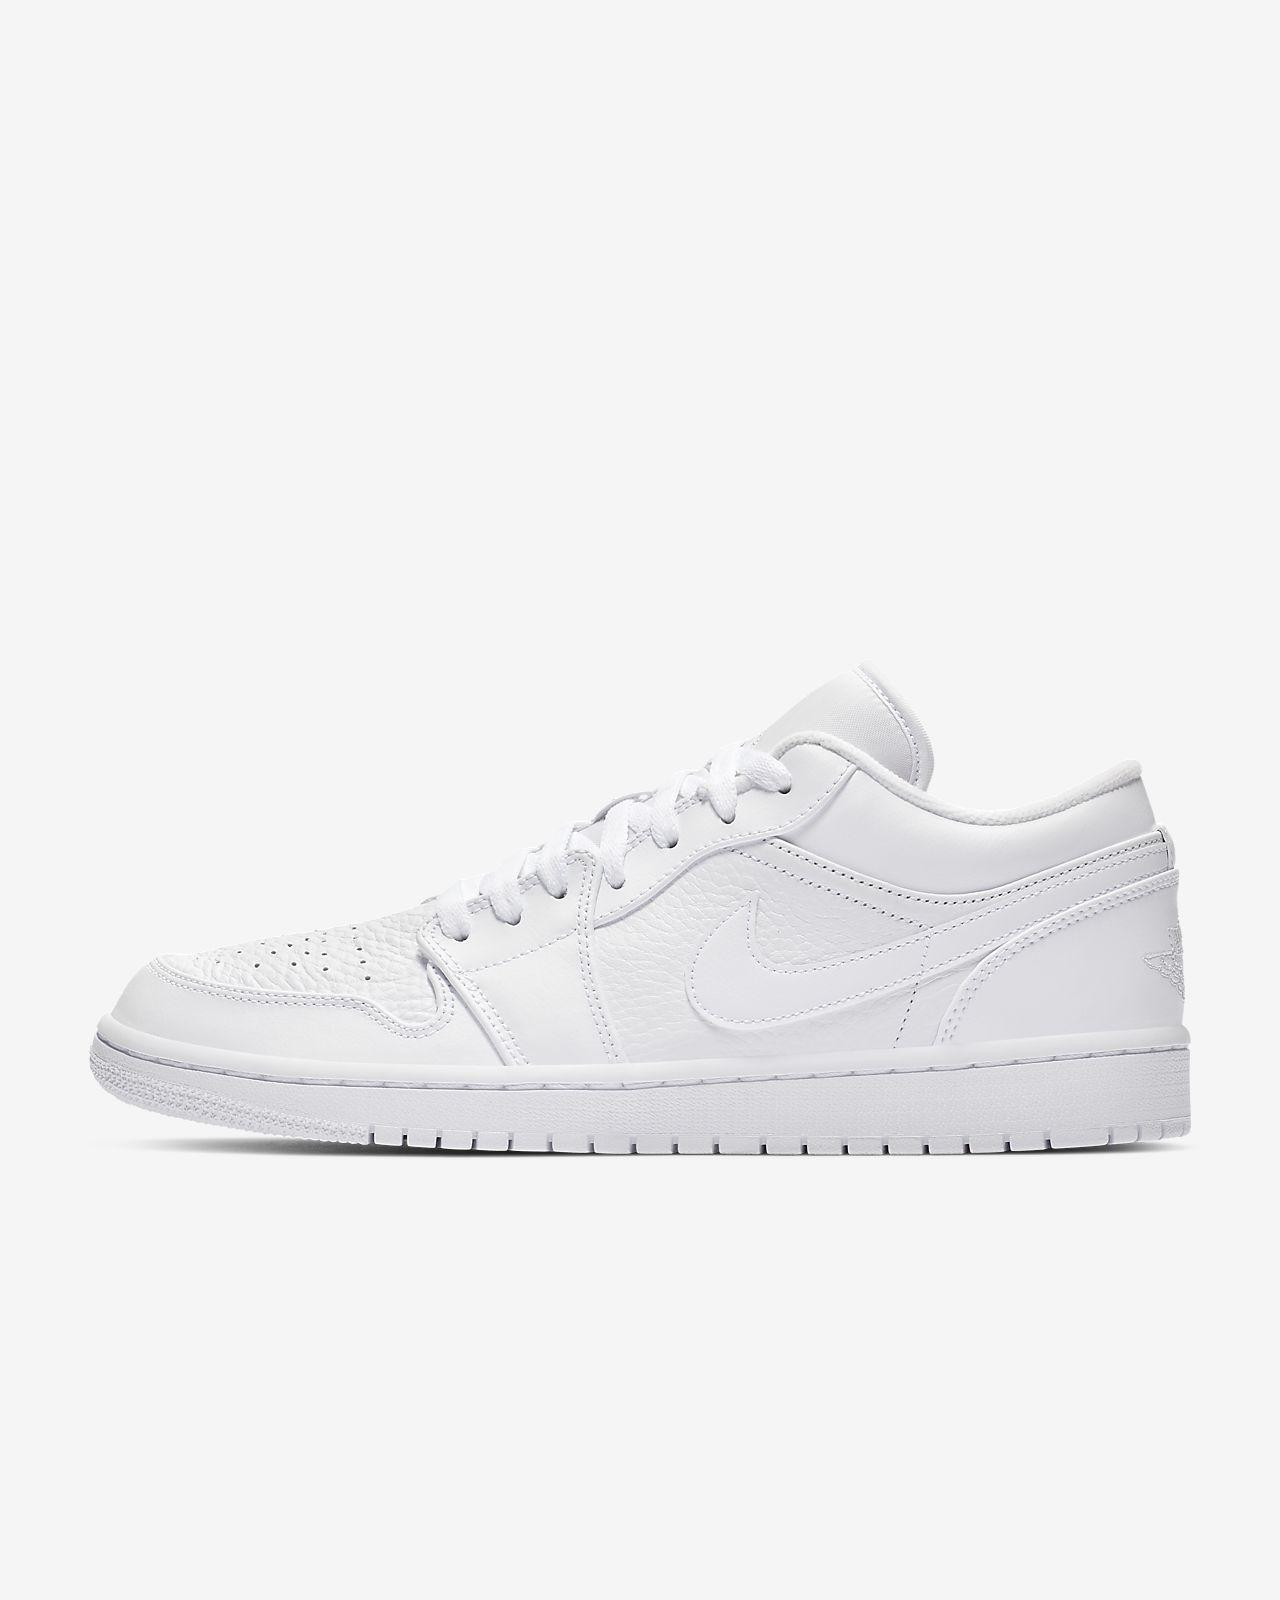 541188b61e082 Air Jordan 1 Low Men s Shoe. Nike.com MA